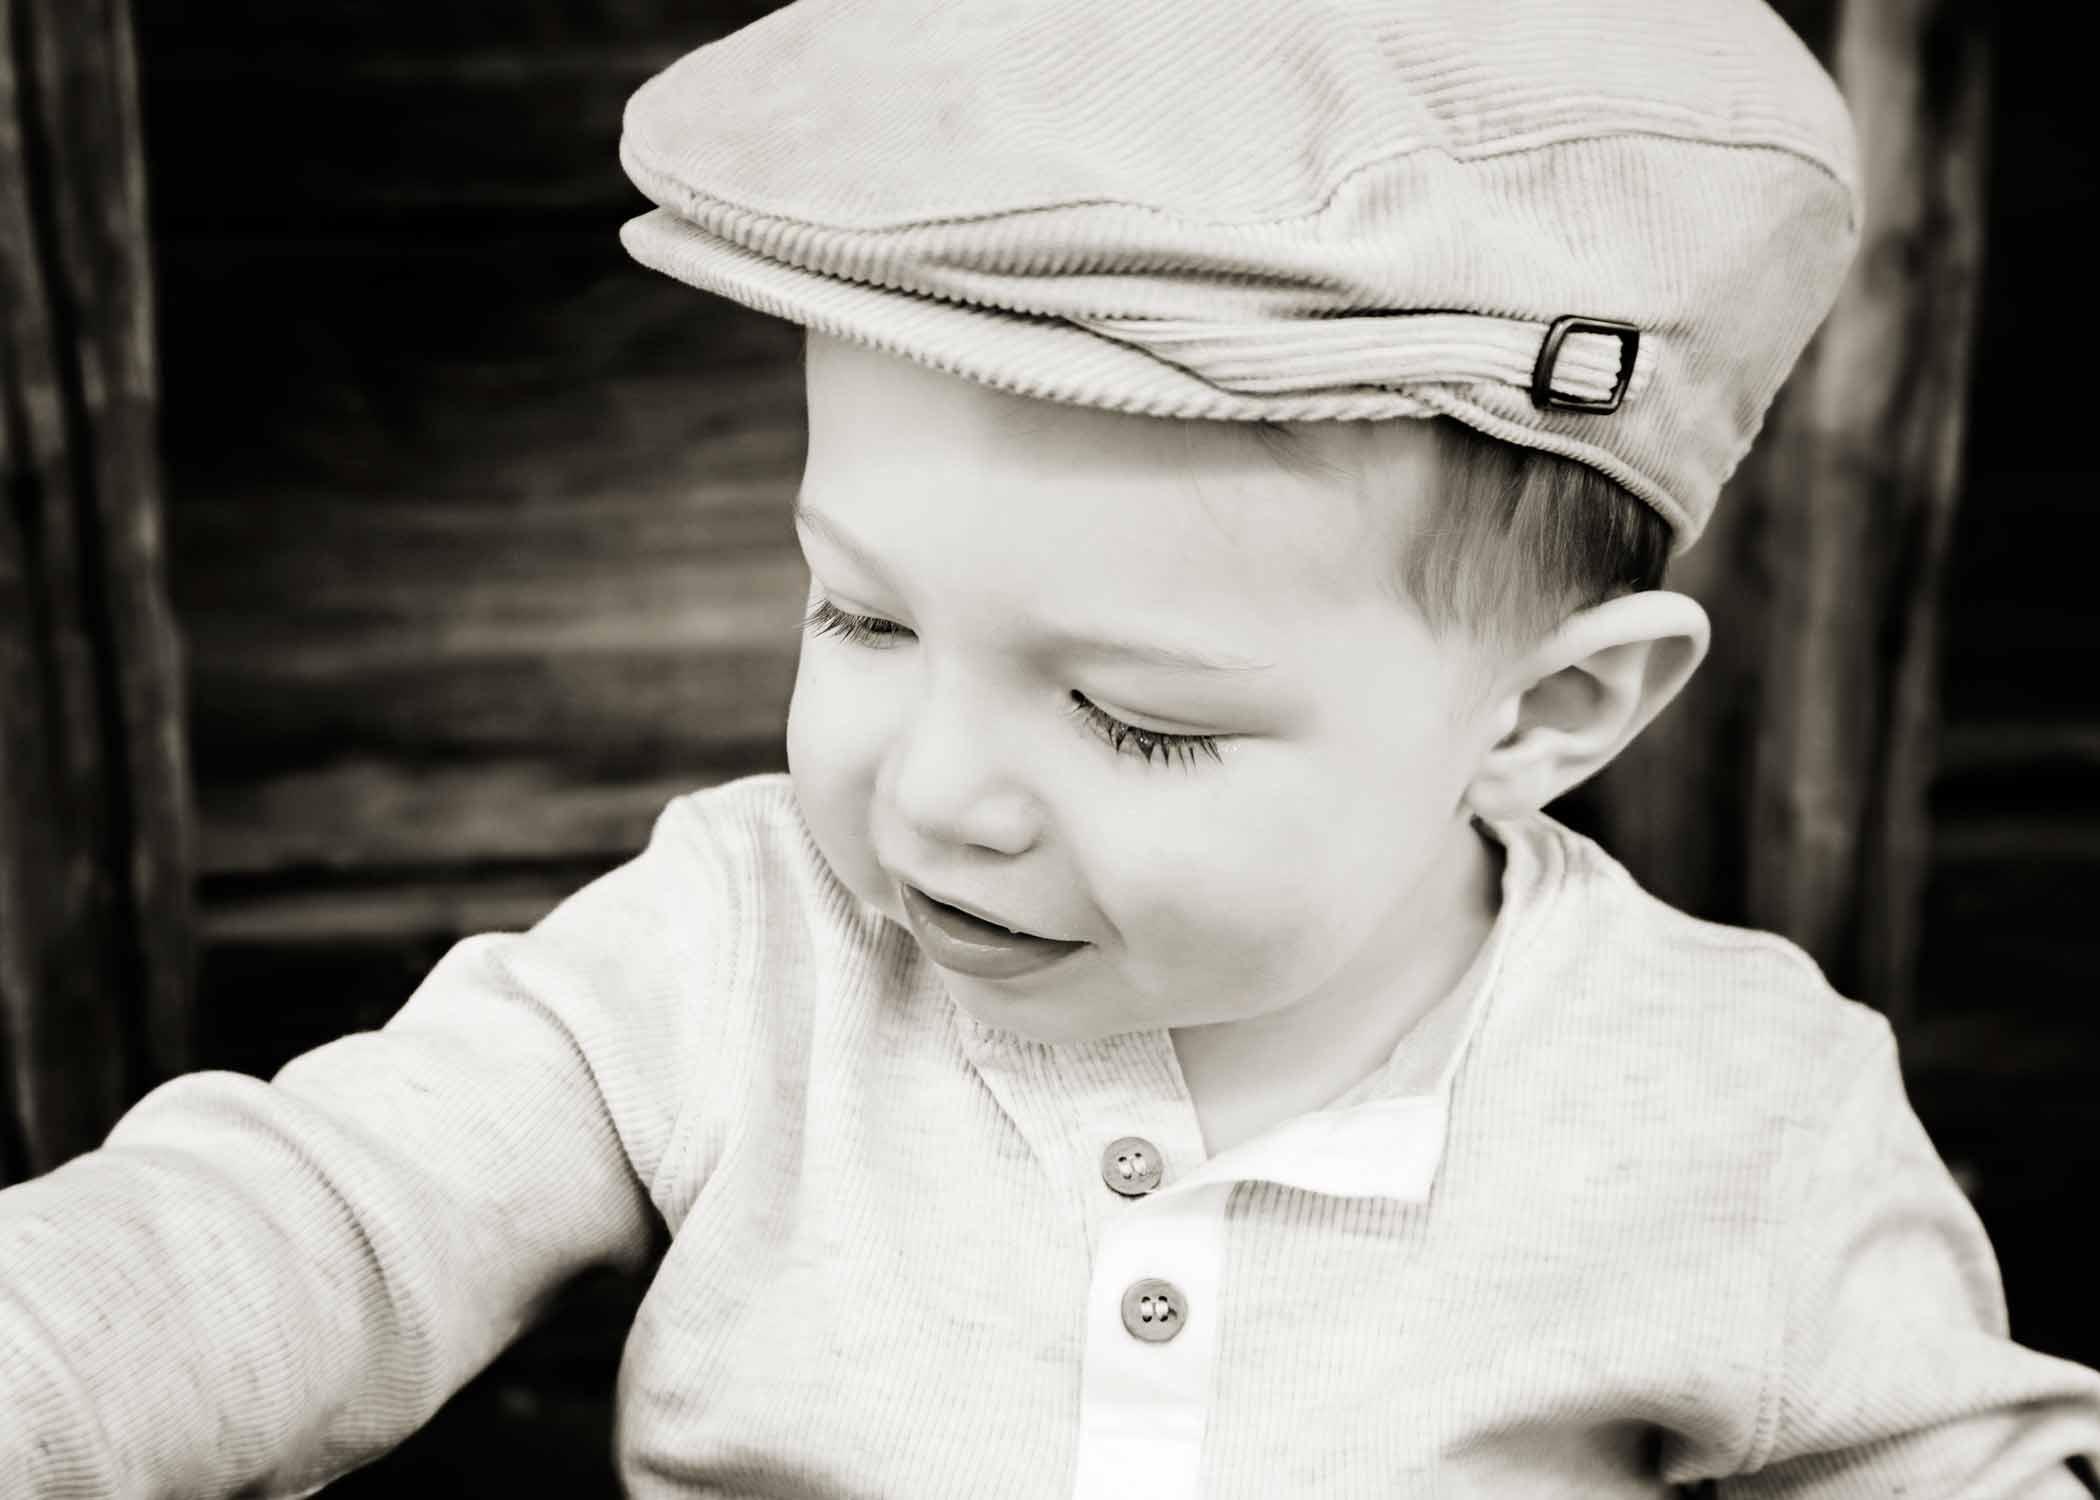 Child wearing a flat cap